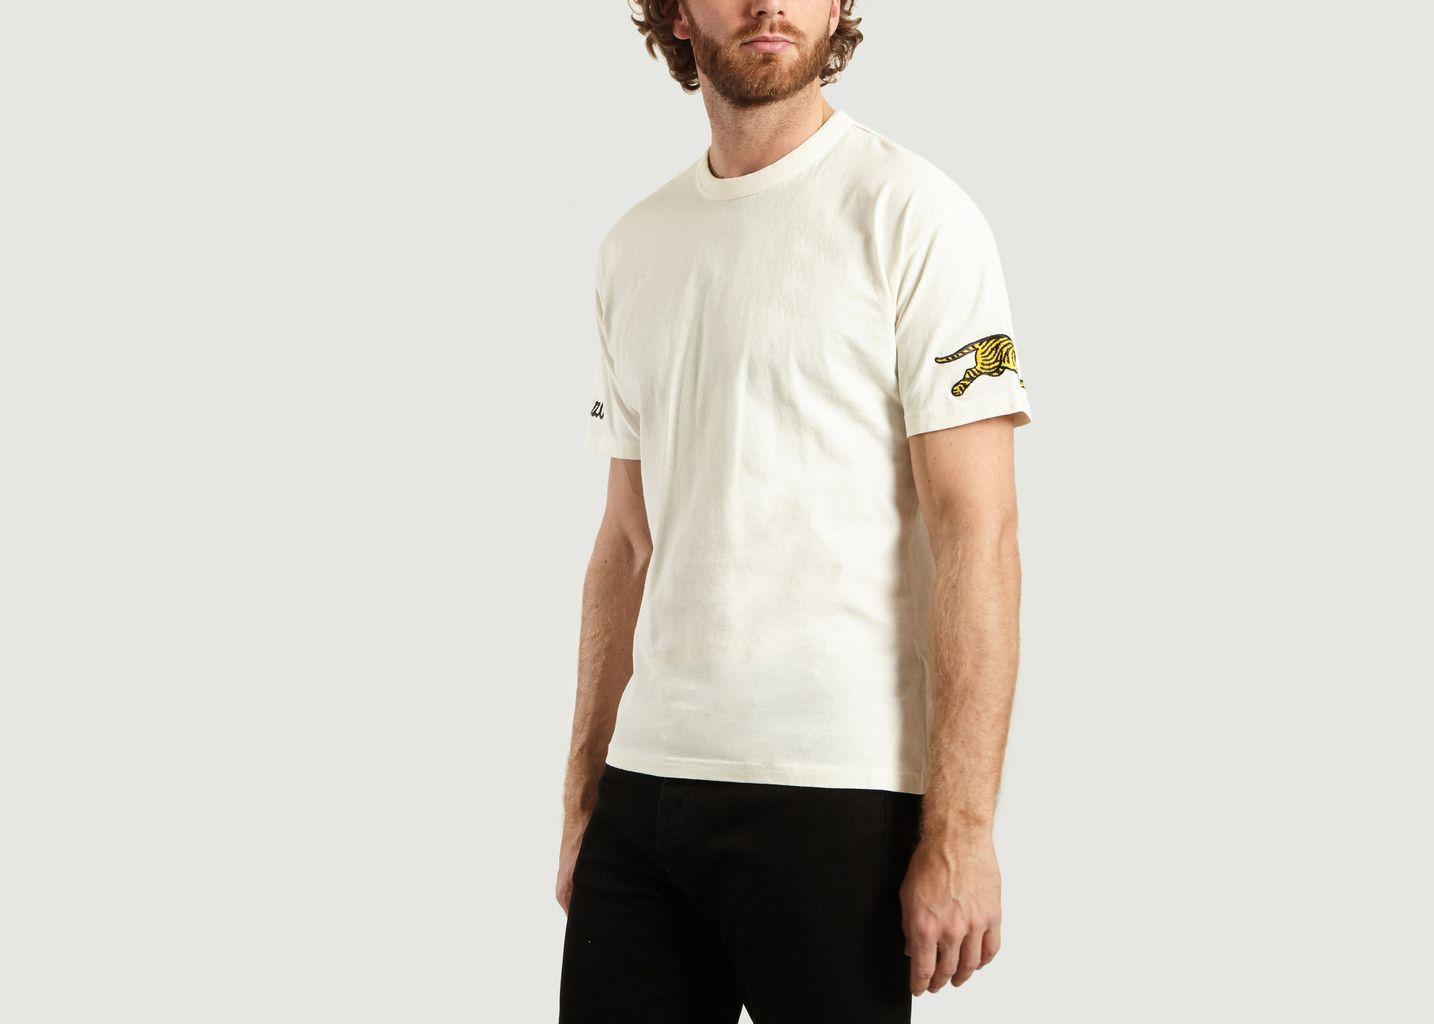 T-Shirt Jumping Tiger - Kenzo